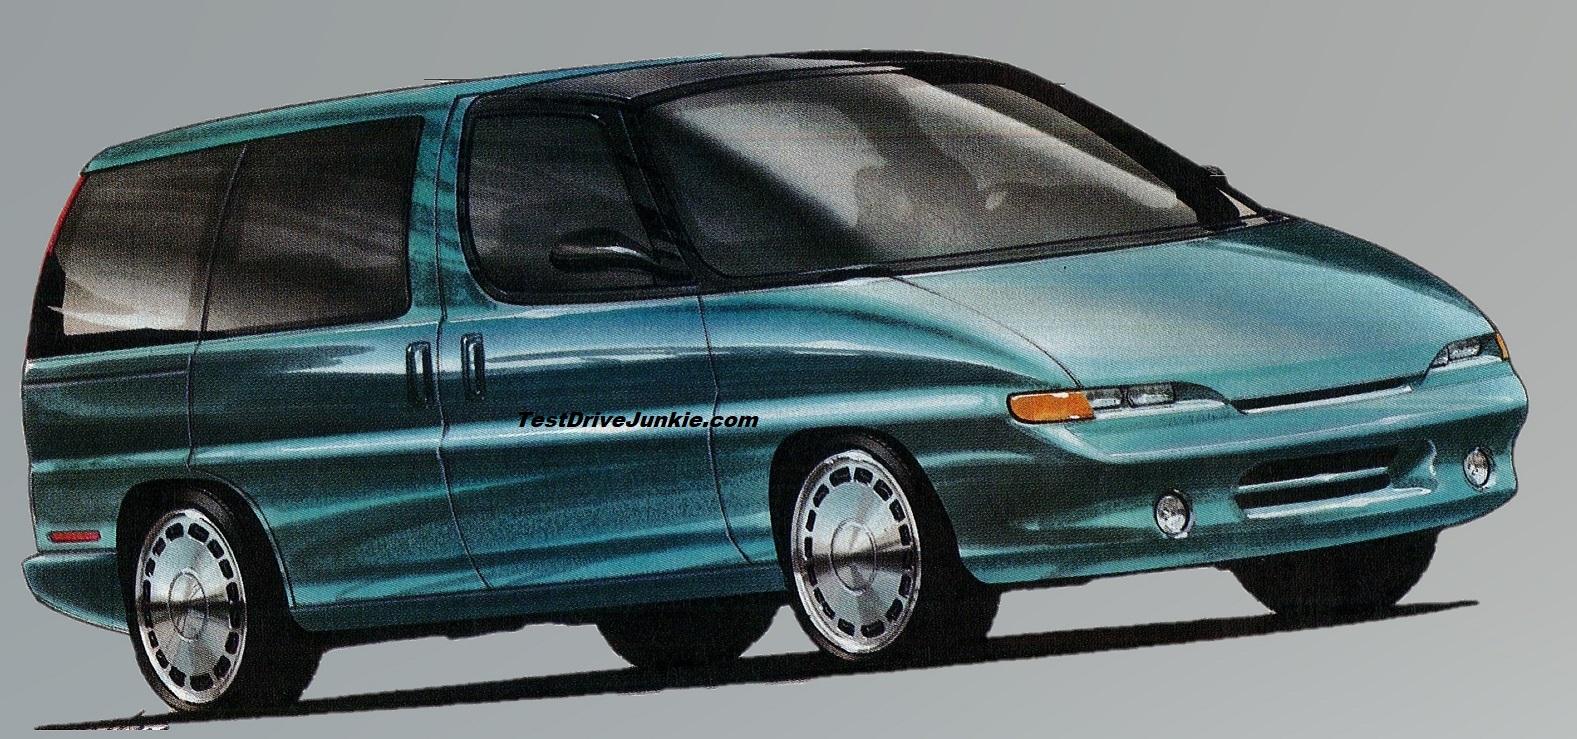 hight resolution of tags 1980 pontiac bonneville1980 1982 chevy camaro 1992 1995 1997 994 apv chevrolet lumina apv general motors gm lumina apv